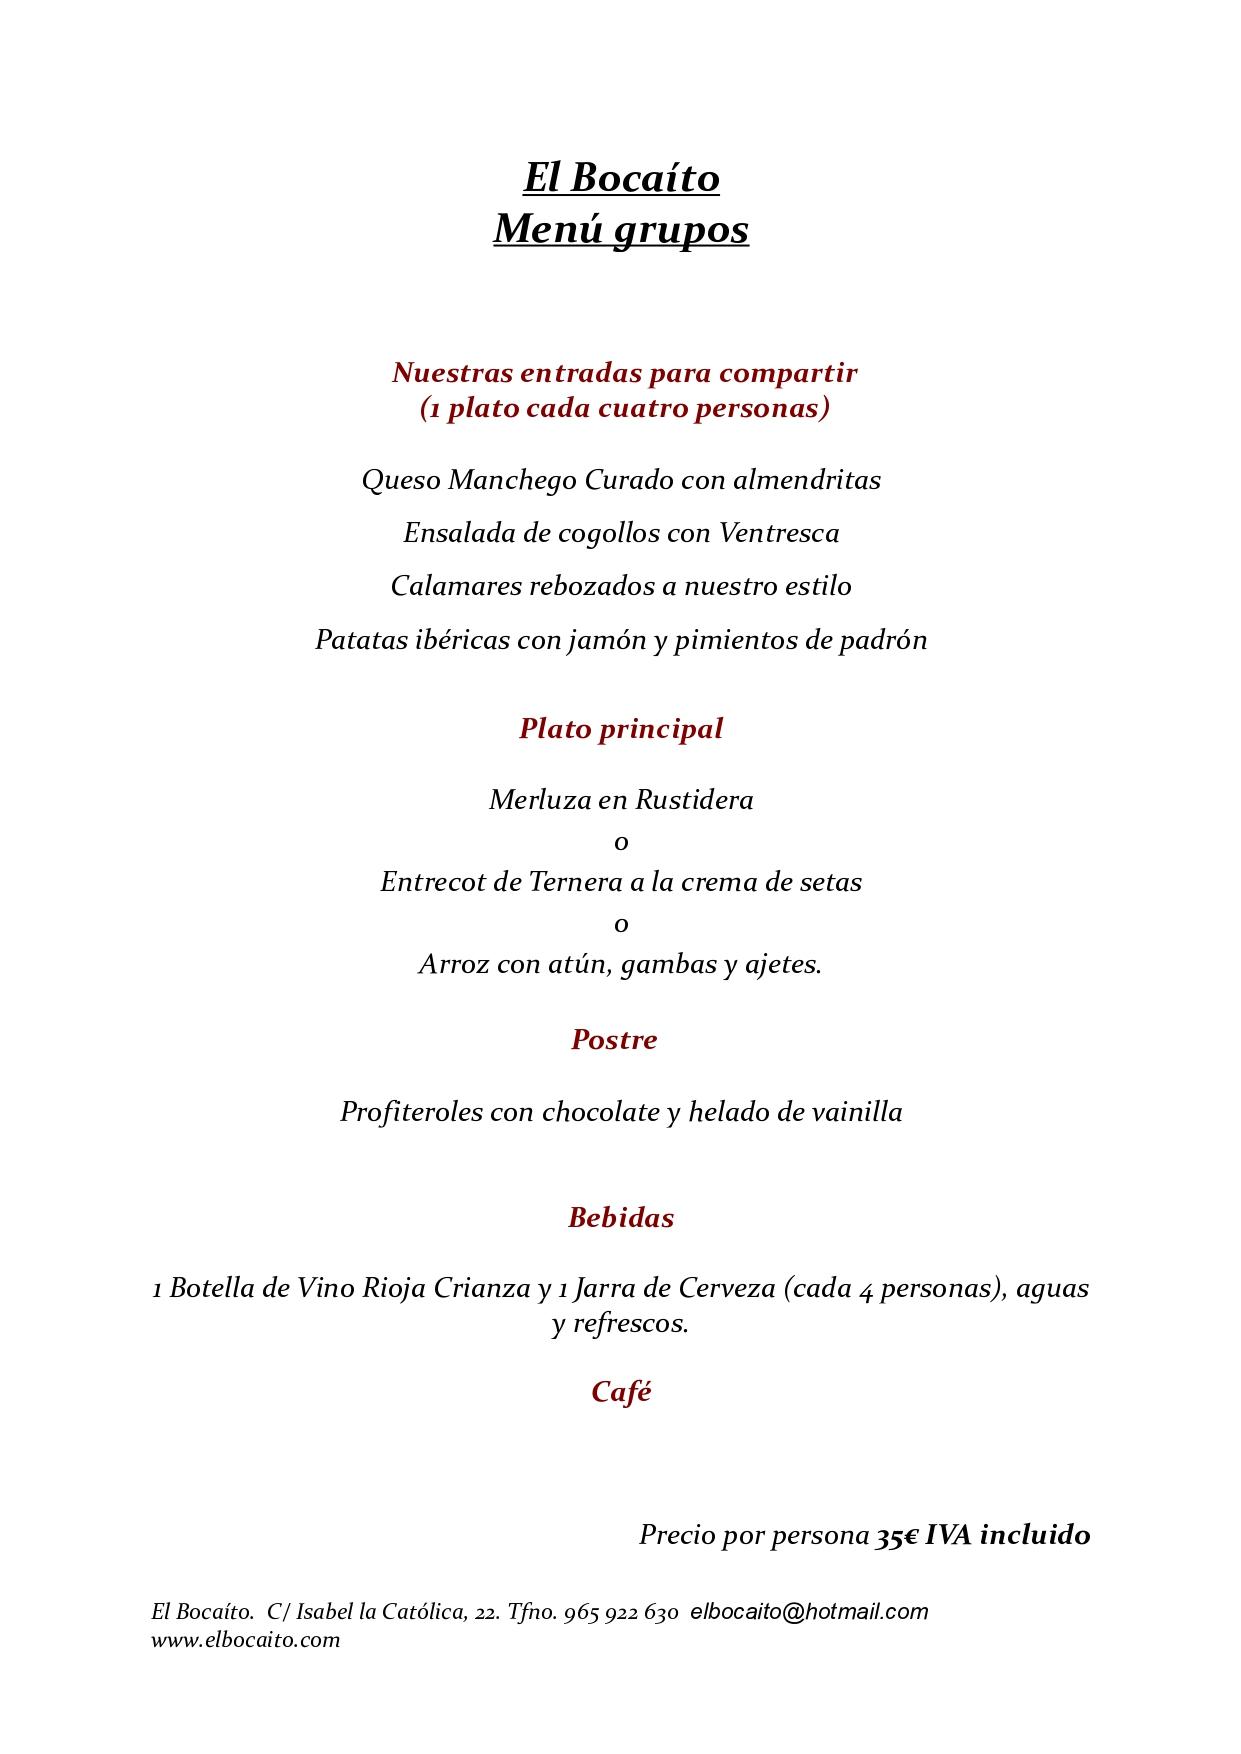 Menu grupos Alicante restaurante